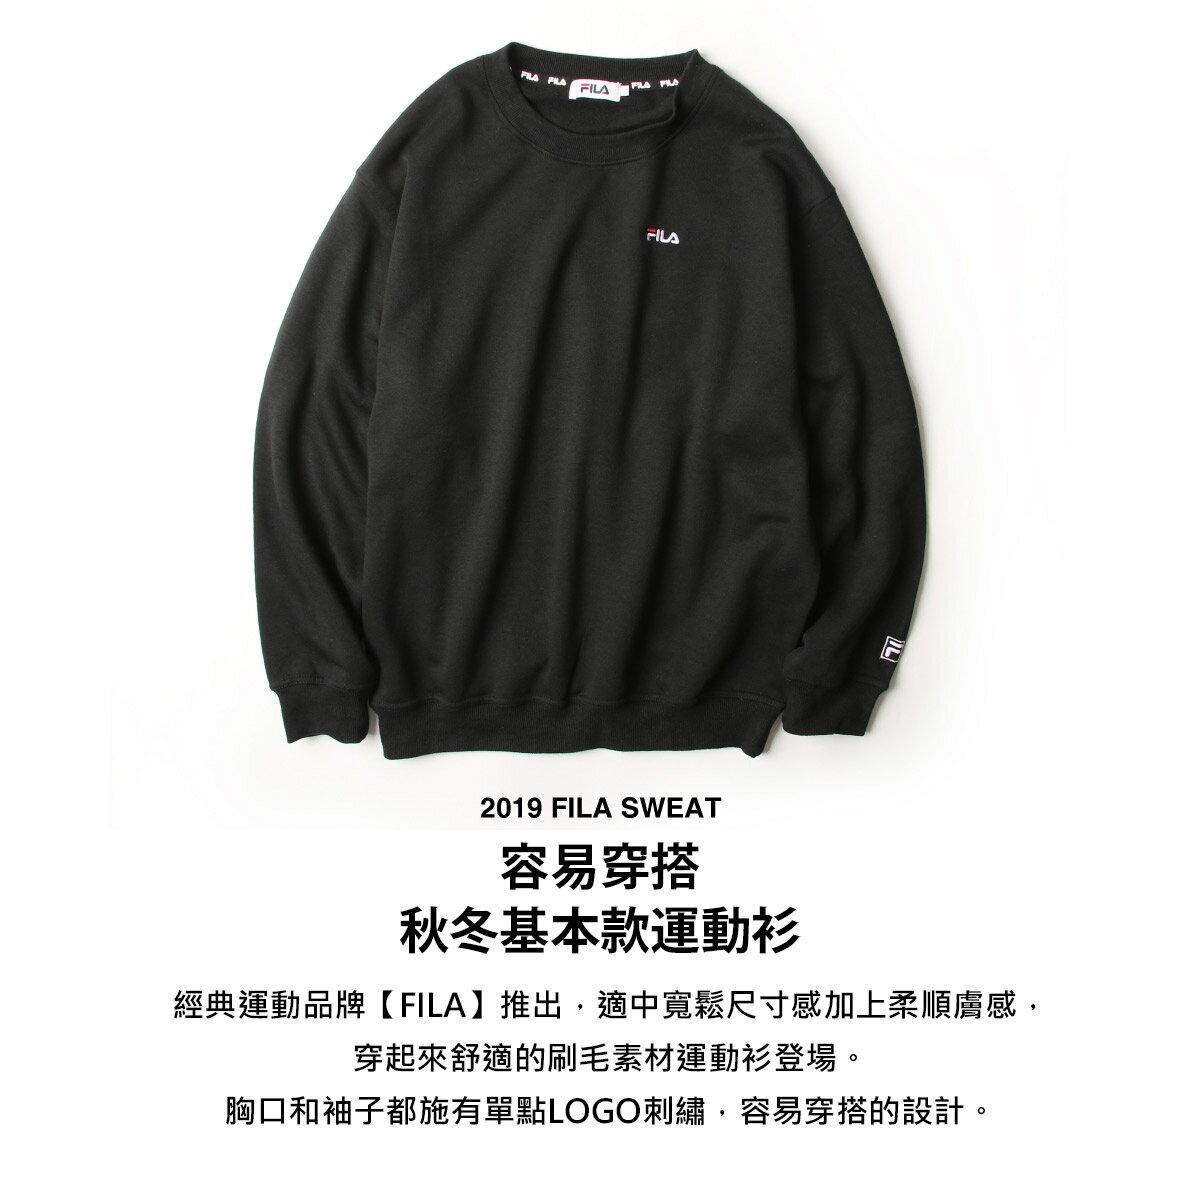 【FILA】LOGO刺繡內刷毛運動衫 5